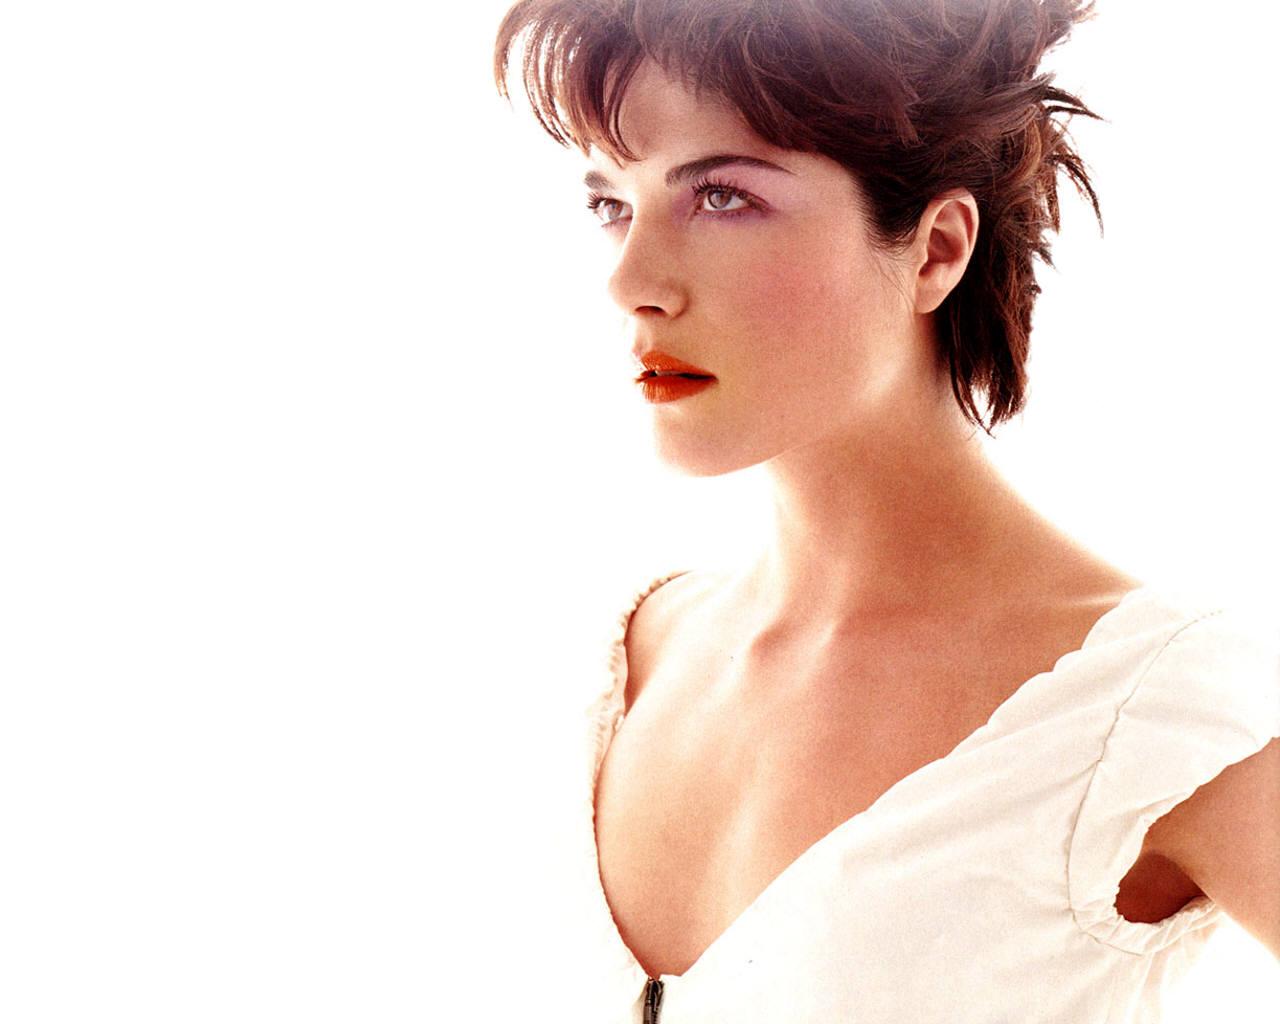 HD Hot Wallpapers: Selma Blair